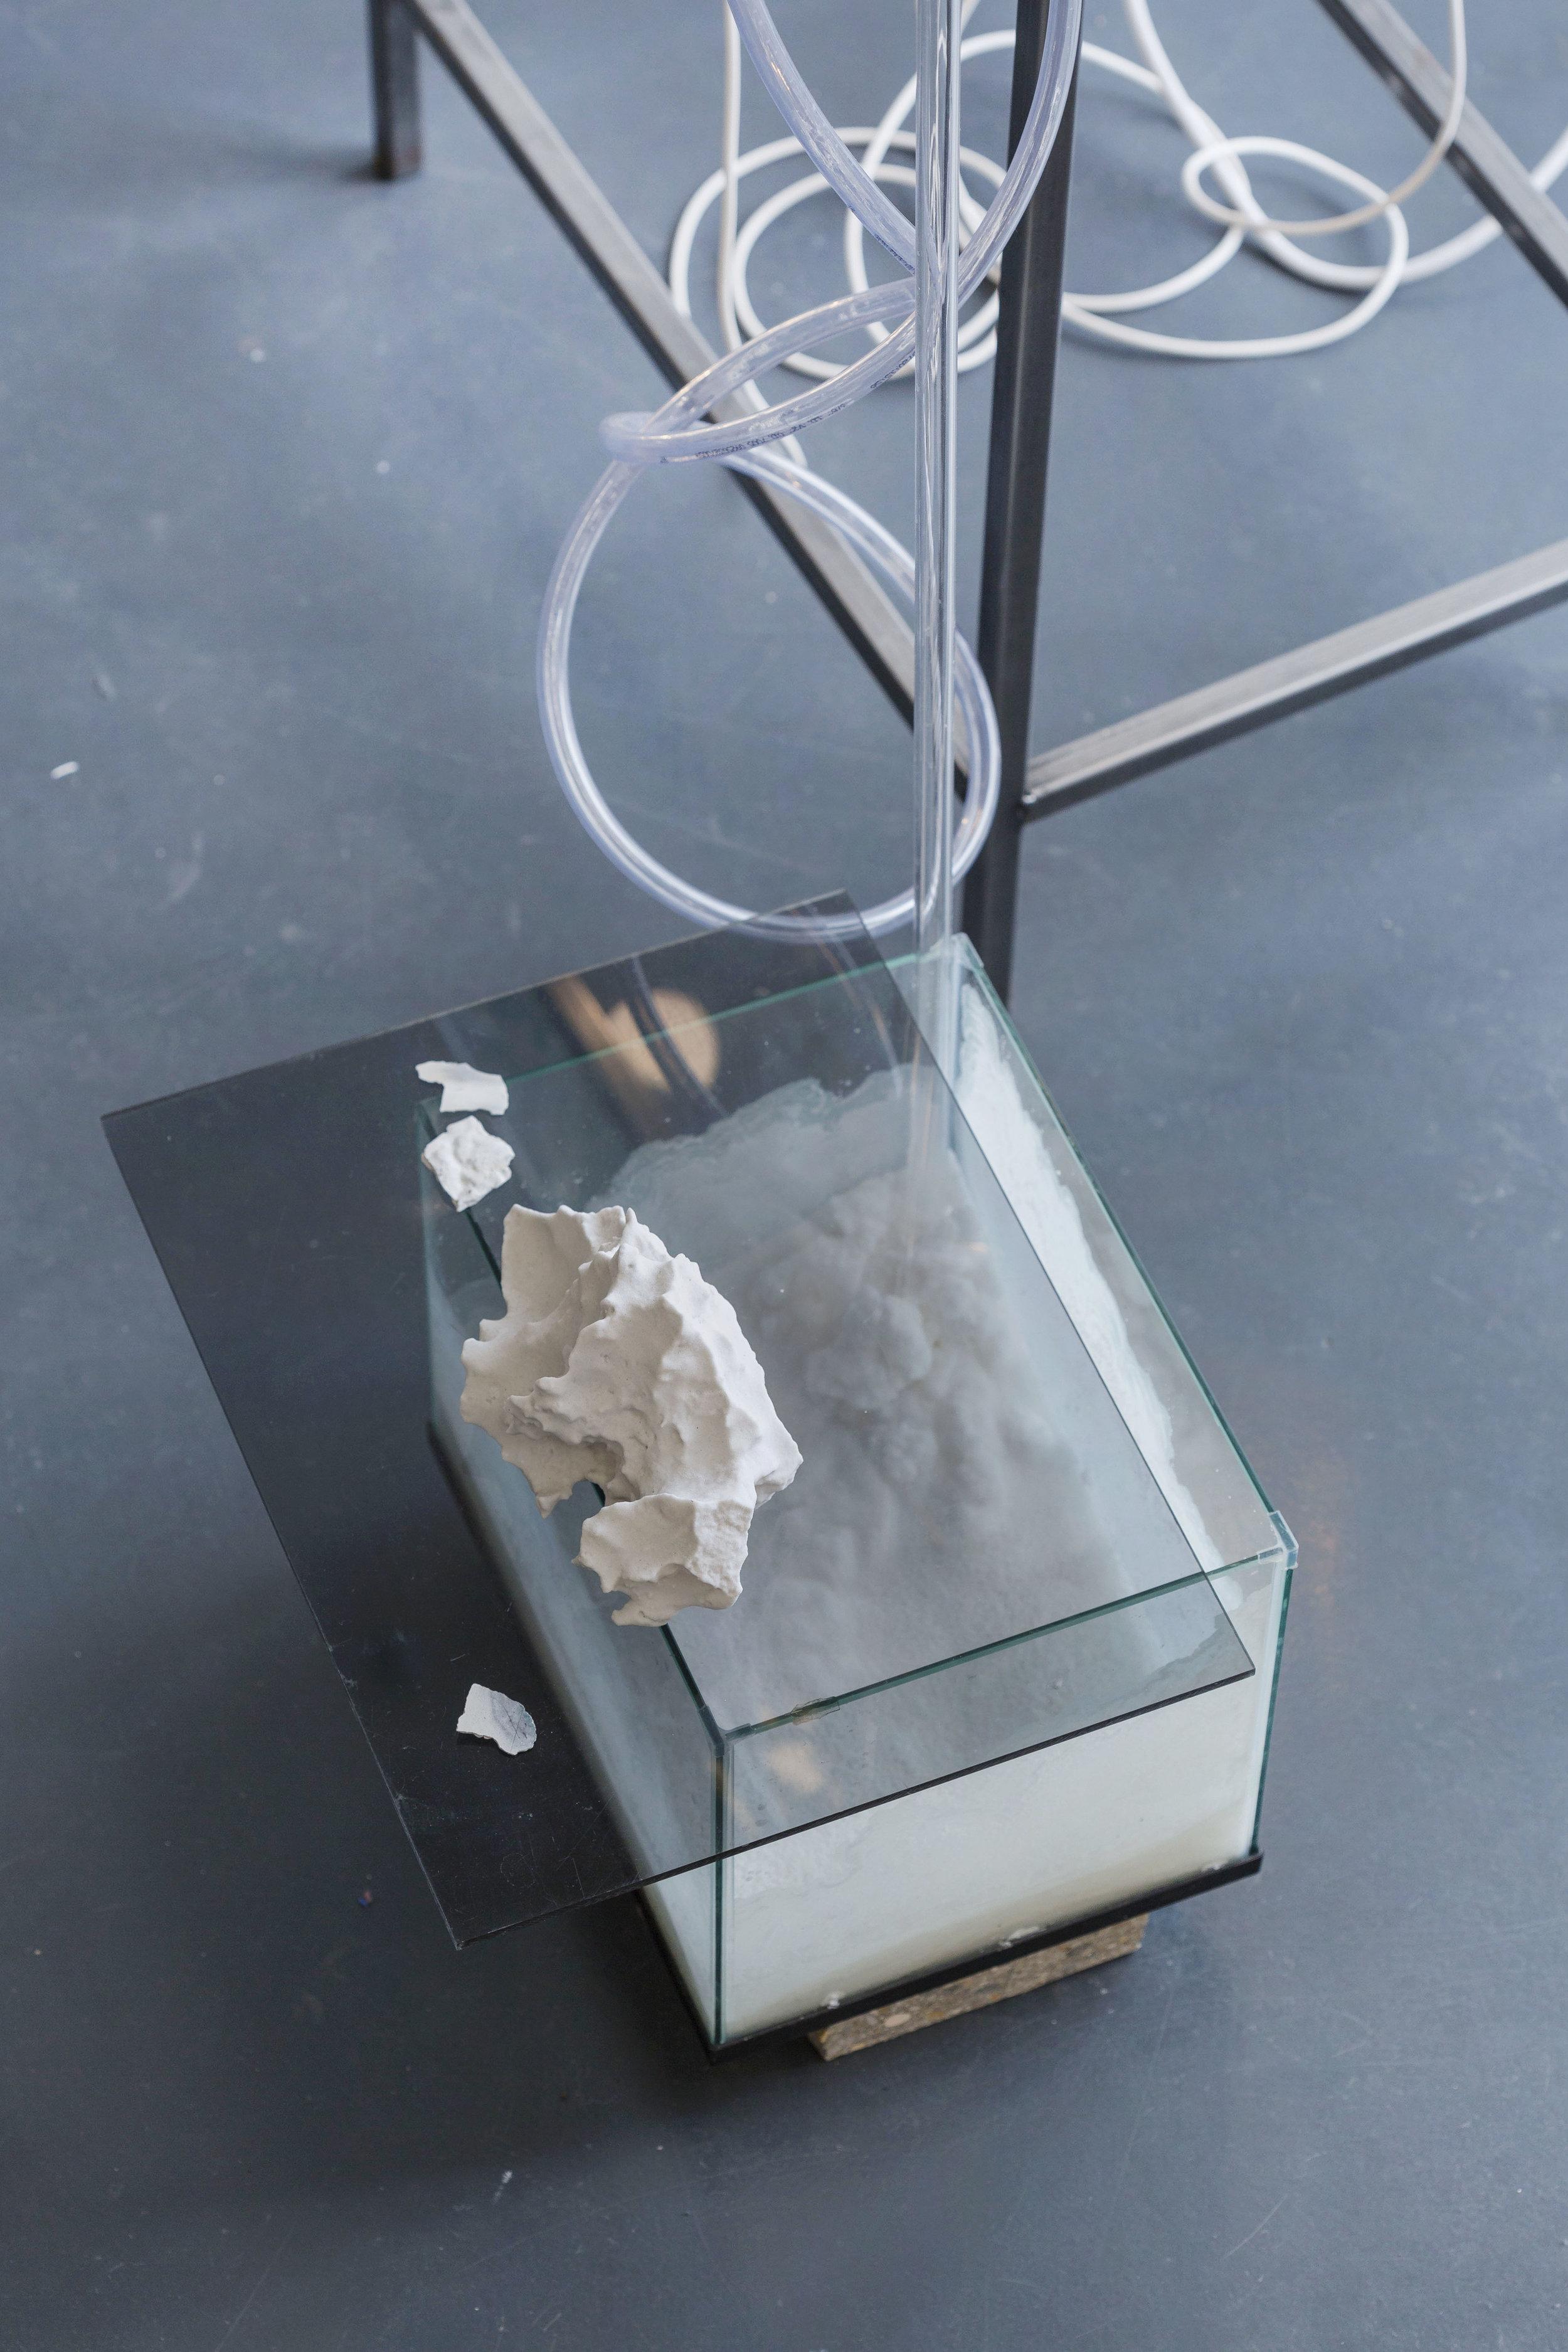 3D printed plaster powder salt rocks : Hannah Rowan,  Melting Transmission  (detail), 2018, image by Oskar Proctor.